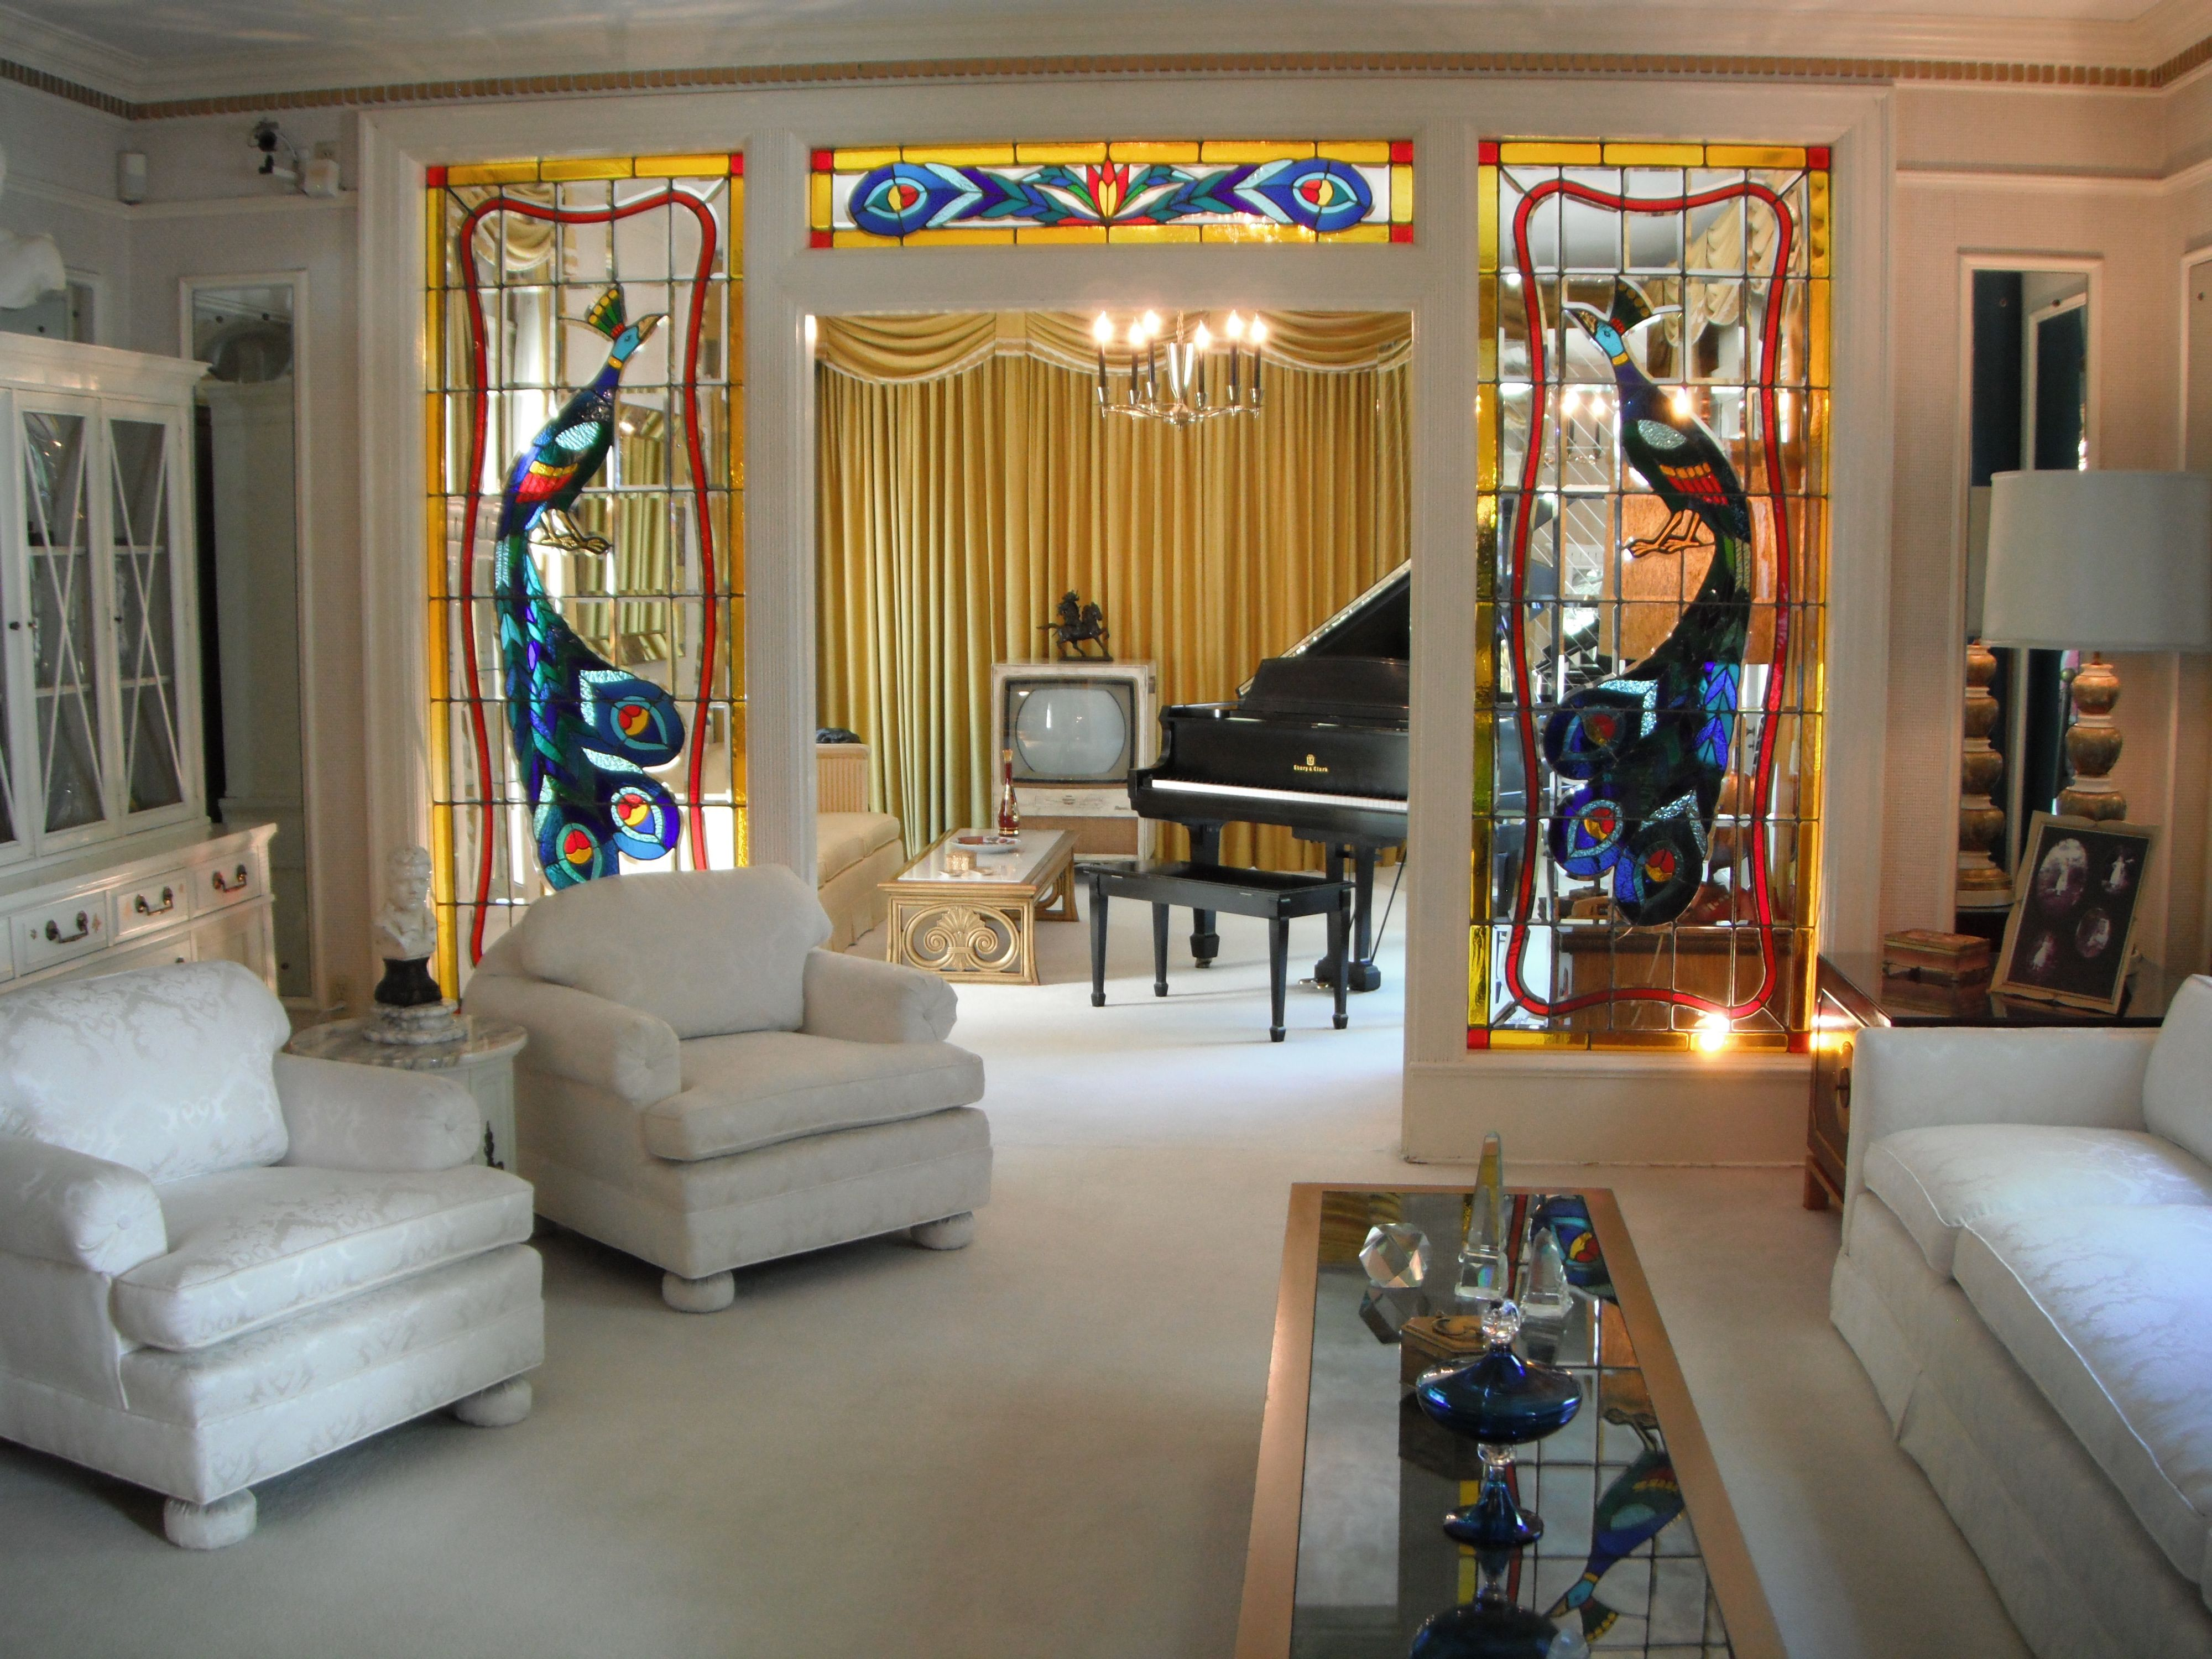 Elvis Presley Living Room Graceland Stained Gl Windows Mid Century Modern Furniture Www Gracelandgraceland Memphis Tnstained